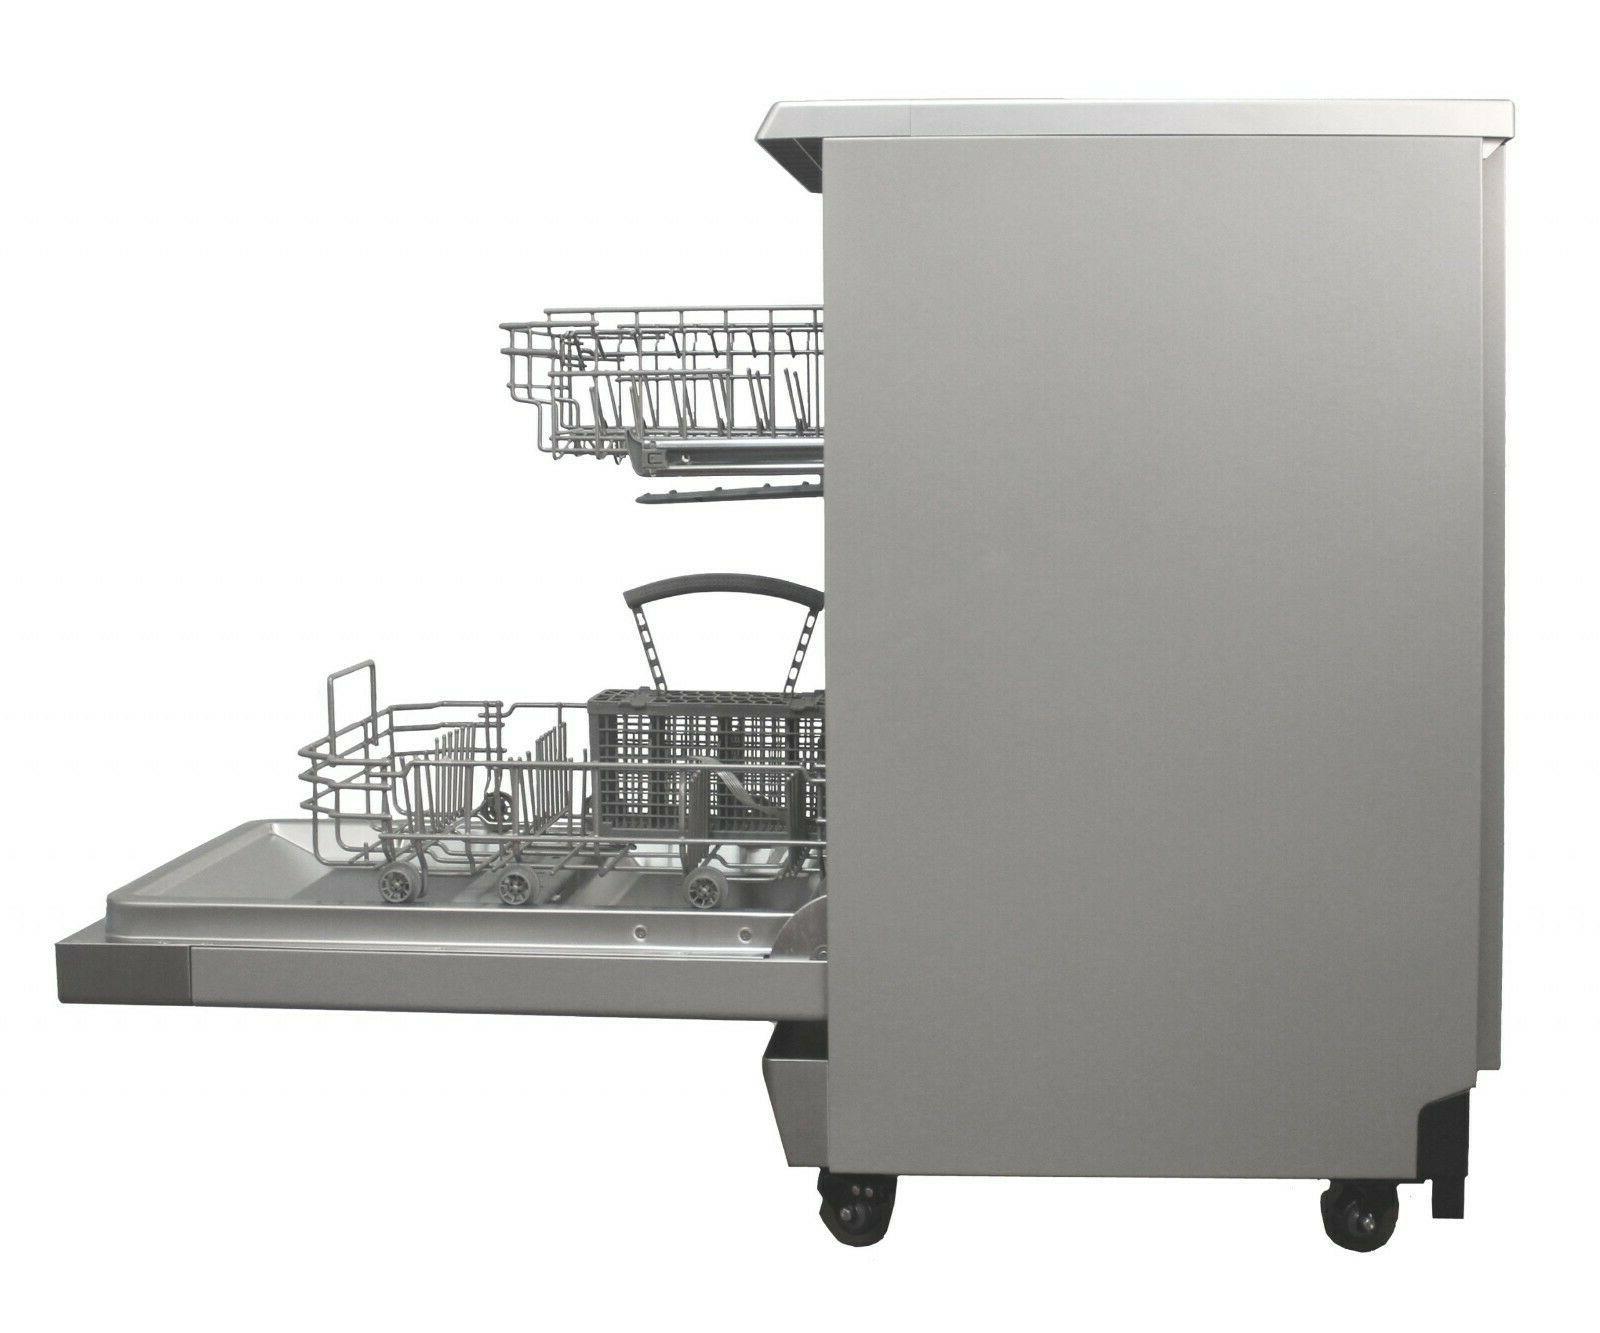 Sunpentown Dishwasher-ENERGY STAR - Steel - SD-9263SS